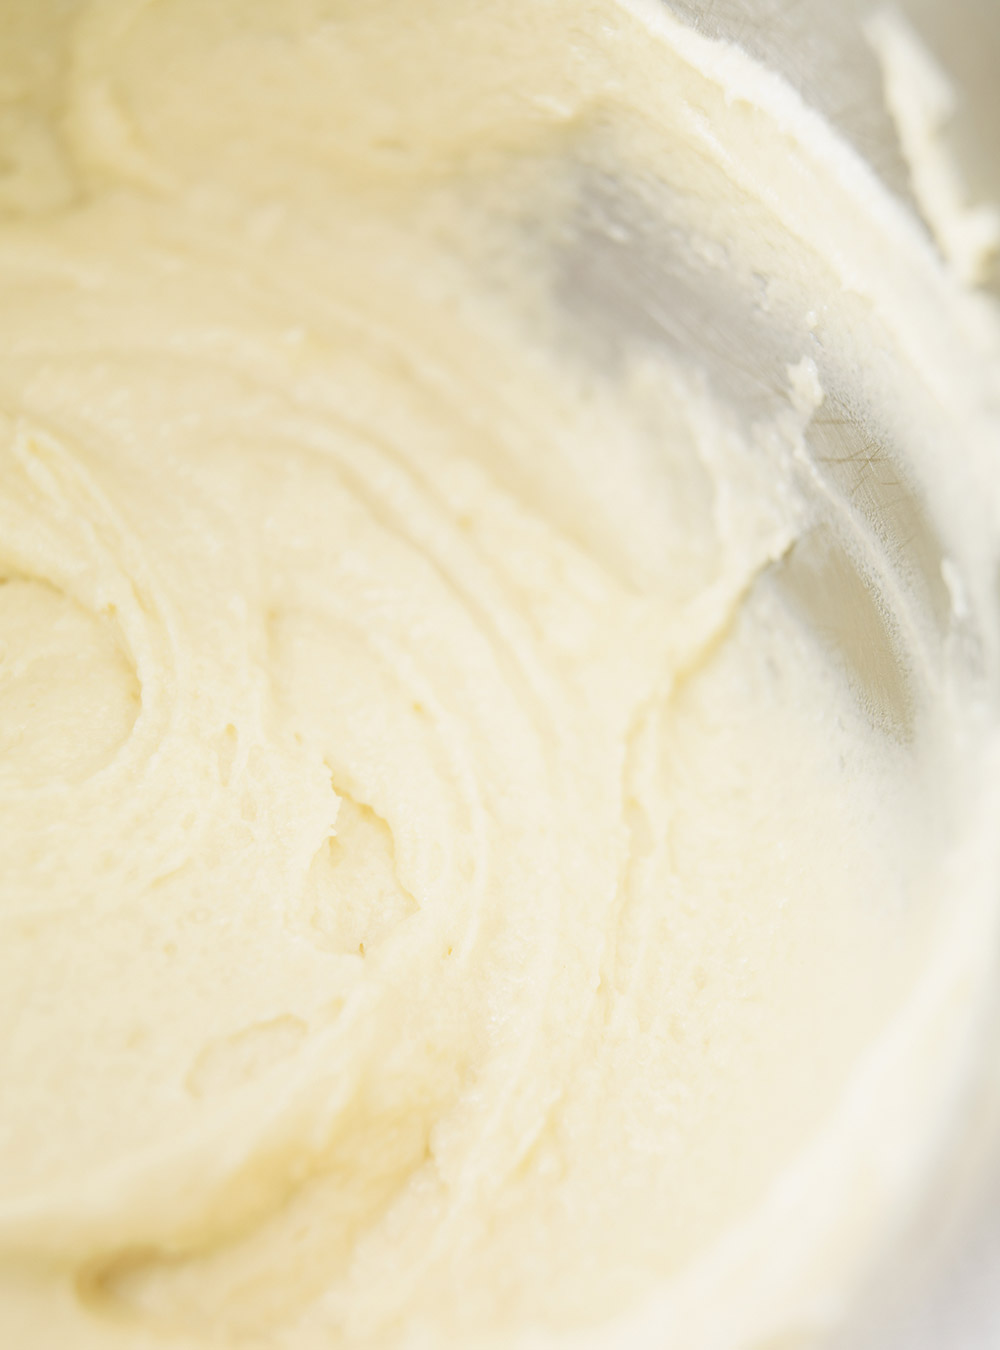 Glaçage à la vanille | ricardo